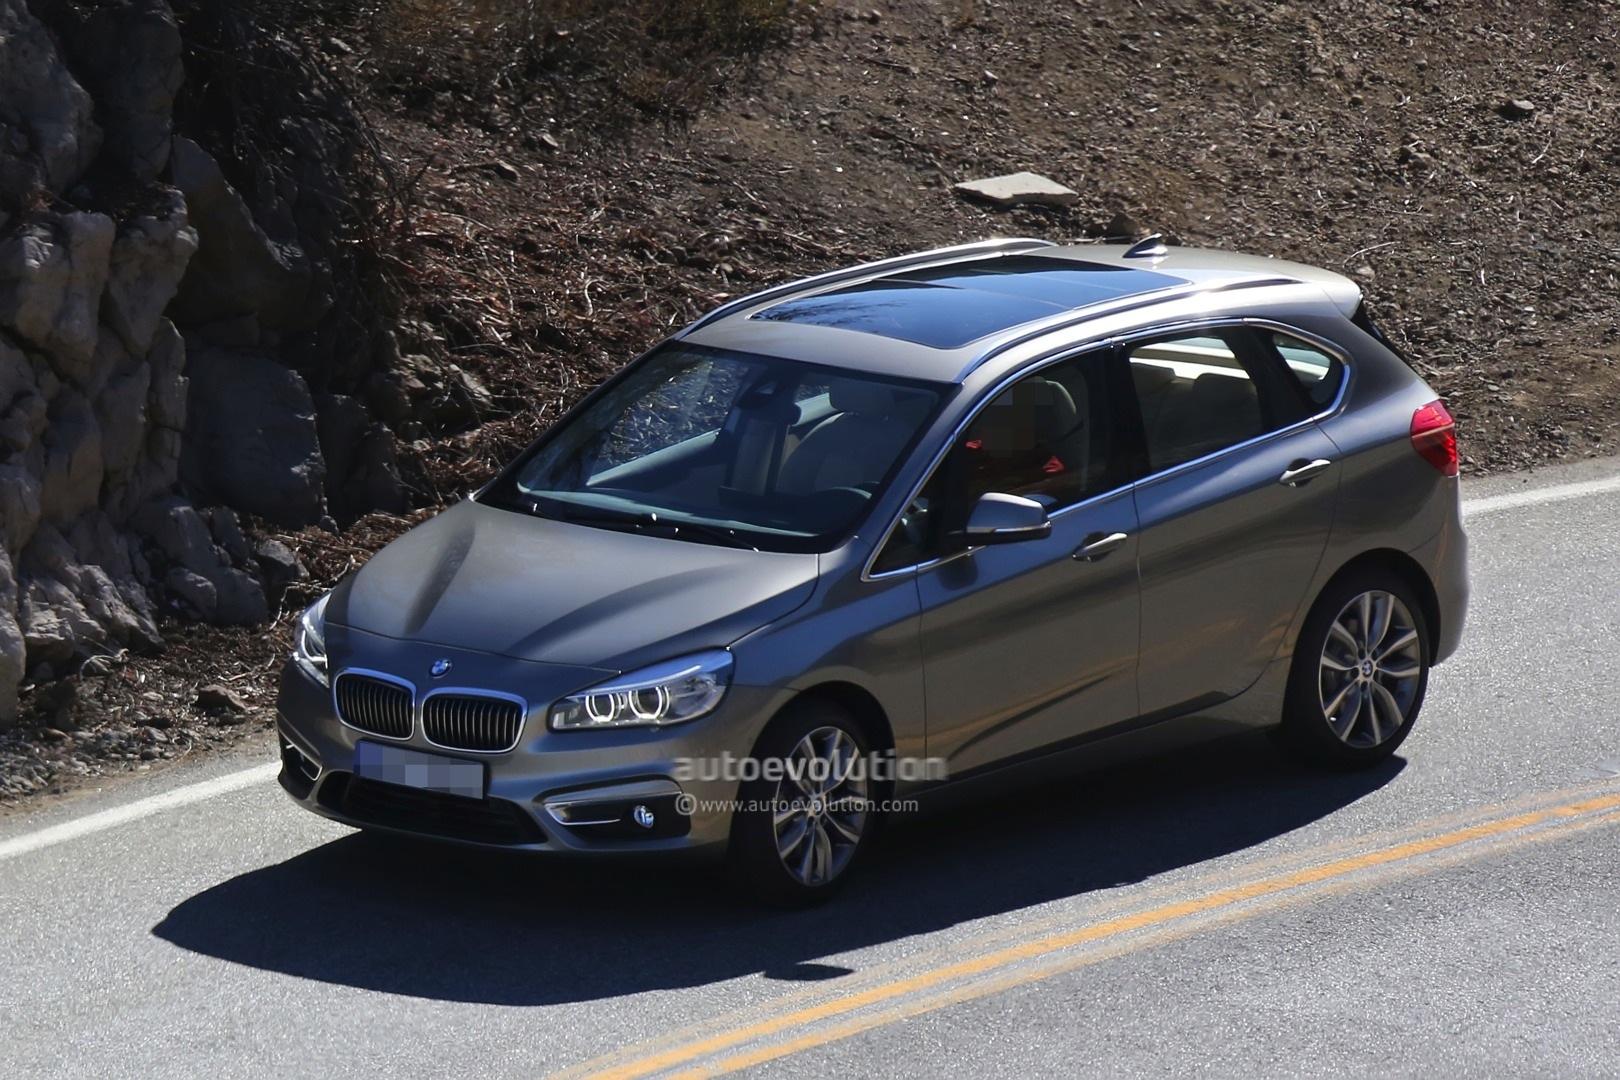 Spyshots BMW Series GT Is The Active Tourer Production Model - Bmw 2 series gt